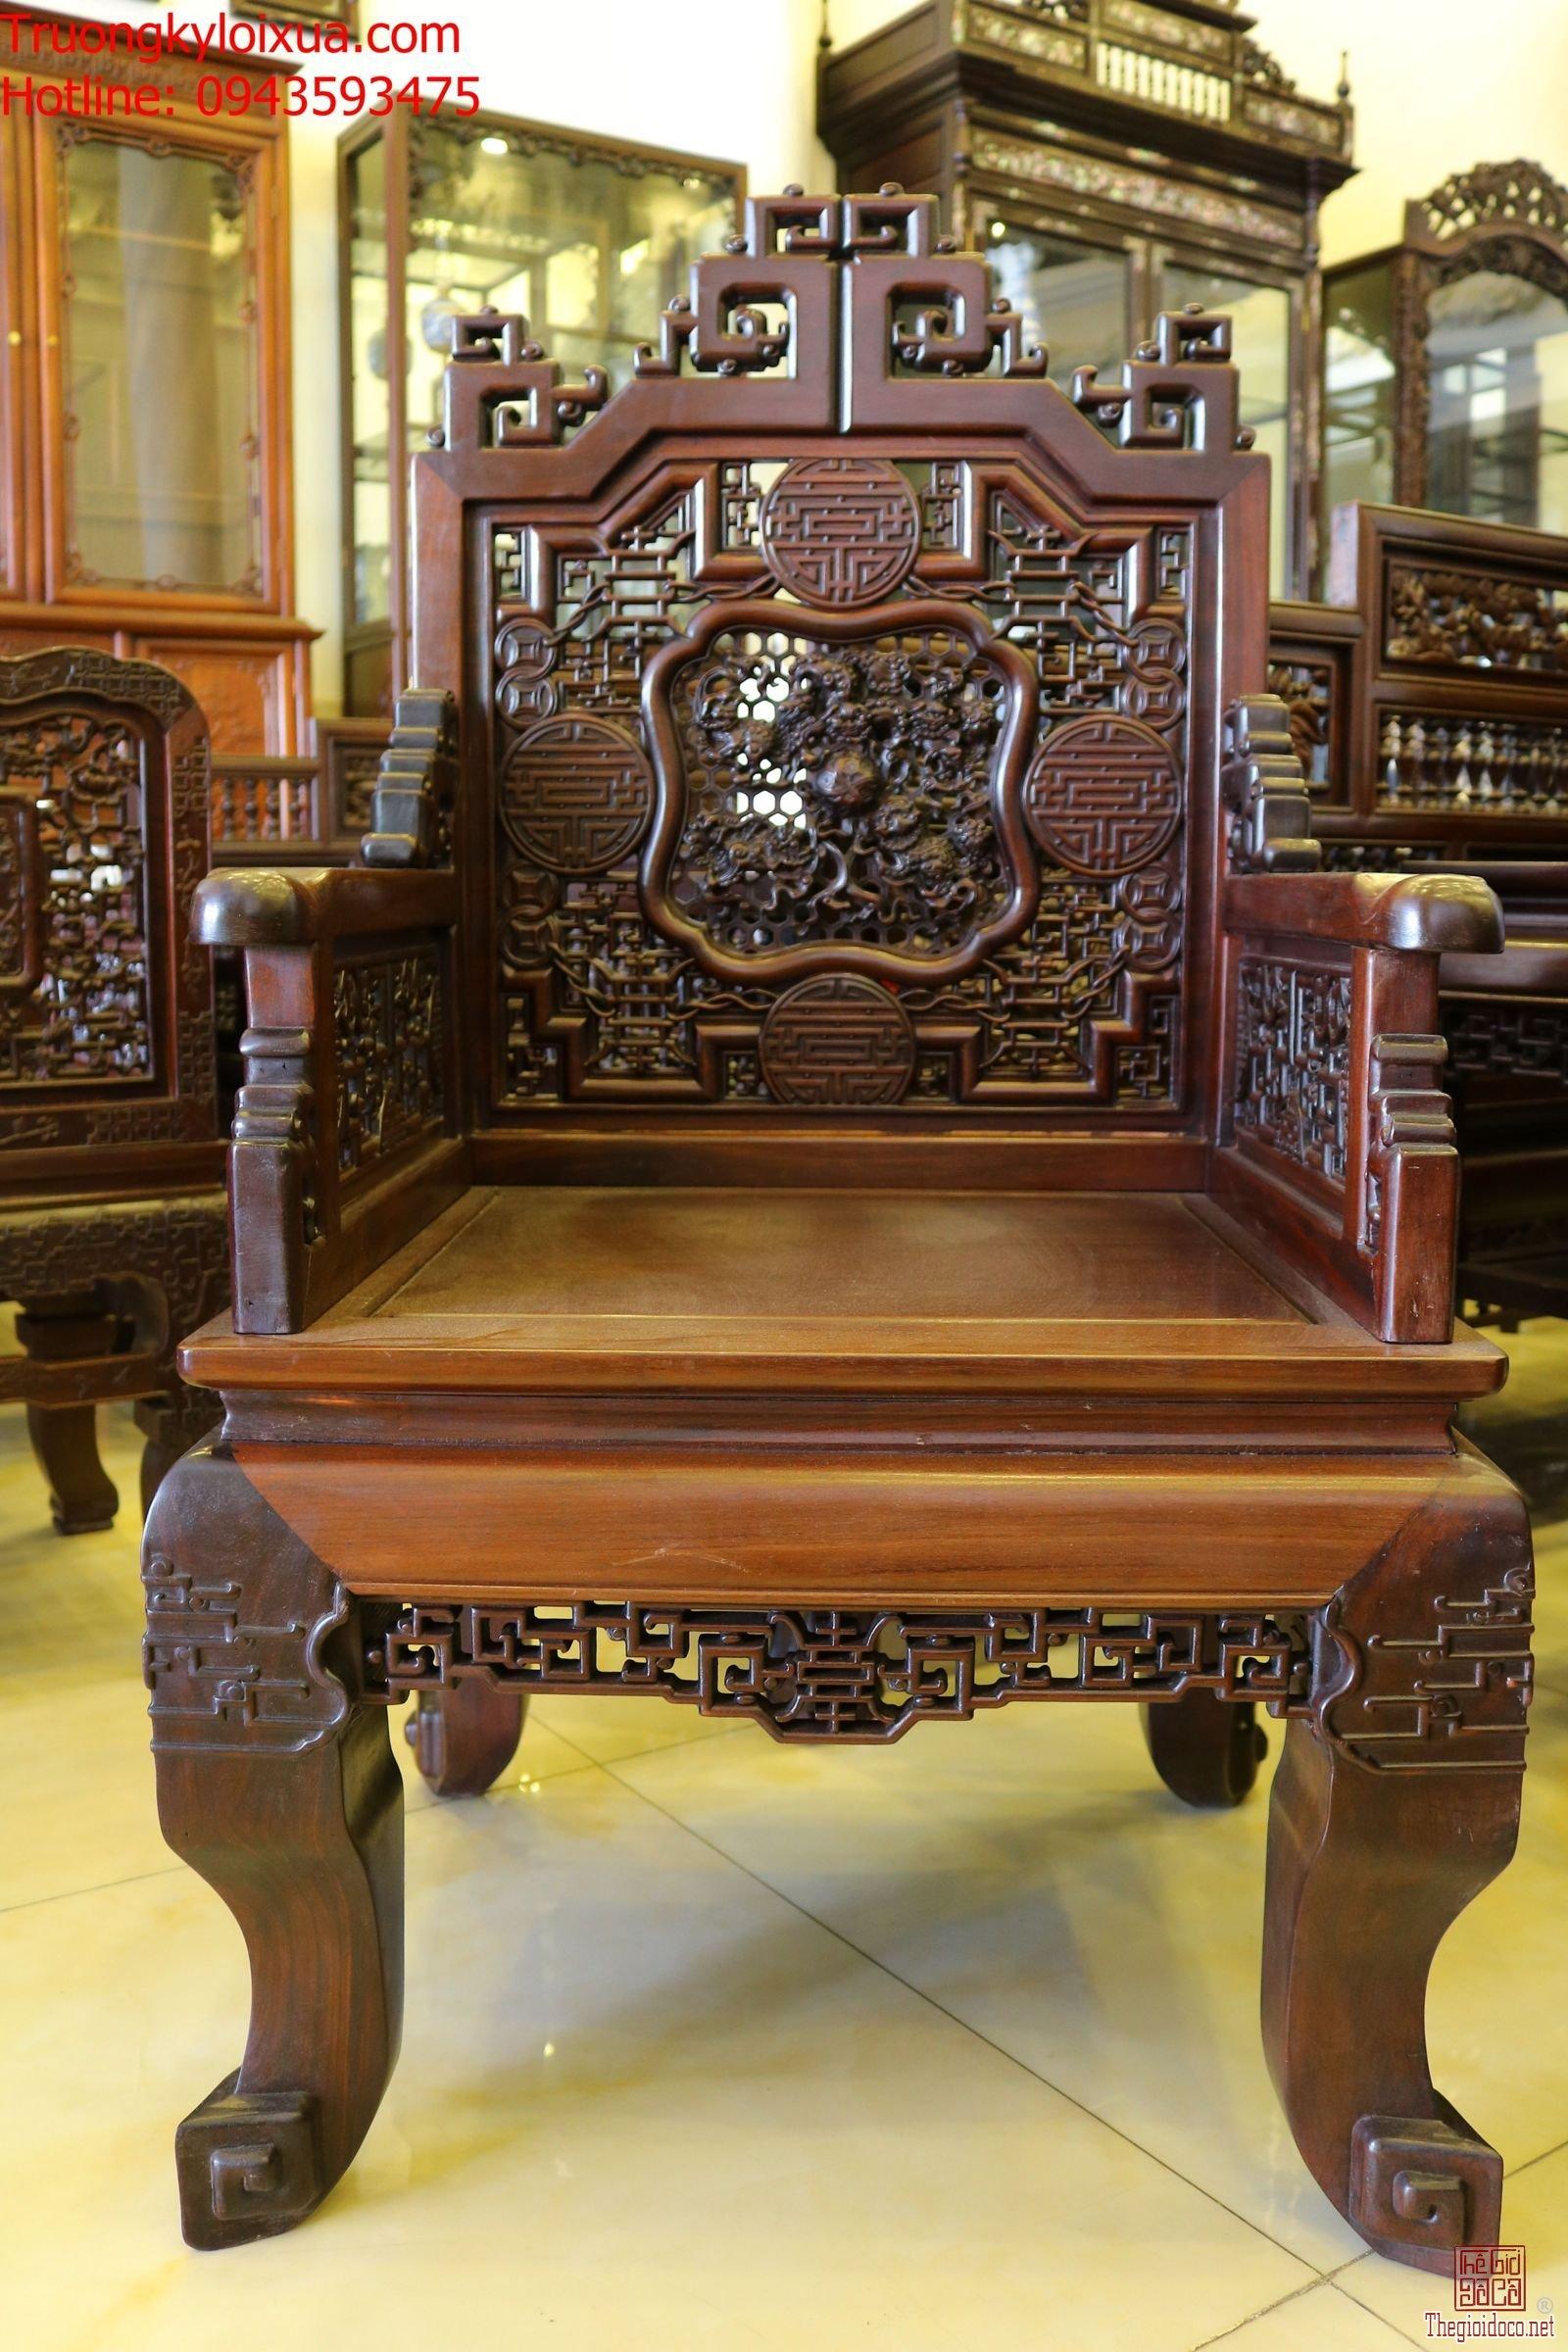 truong-ky-ngu-lan-von-cau (6).JPG